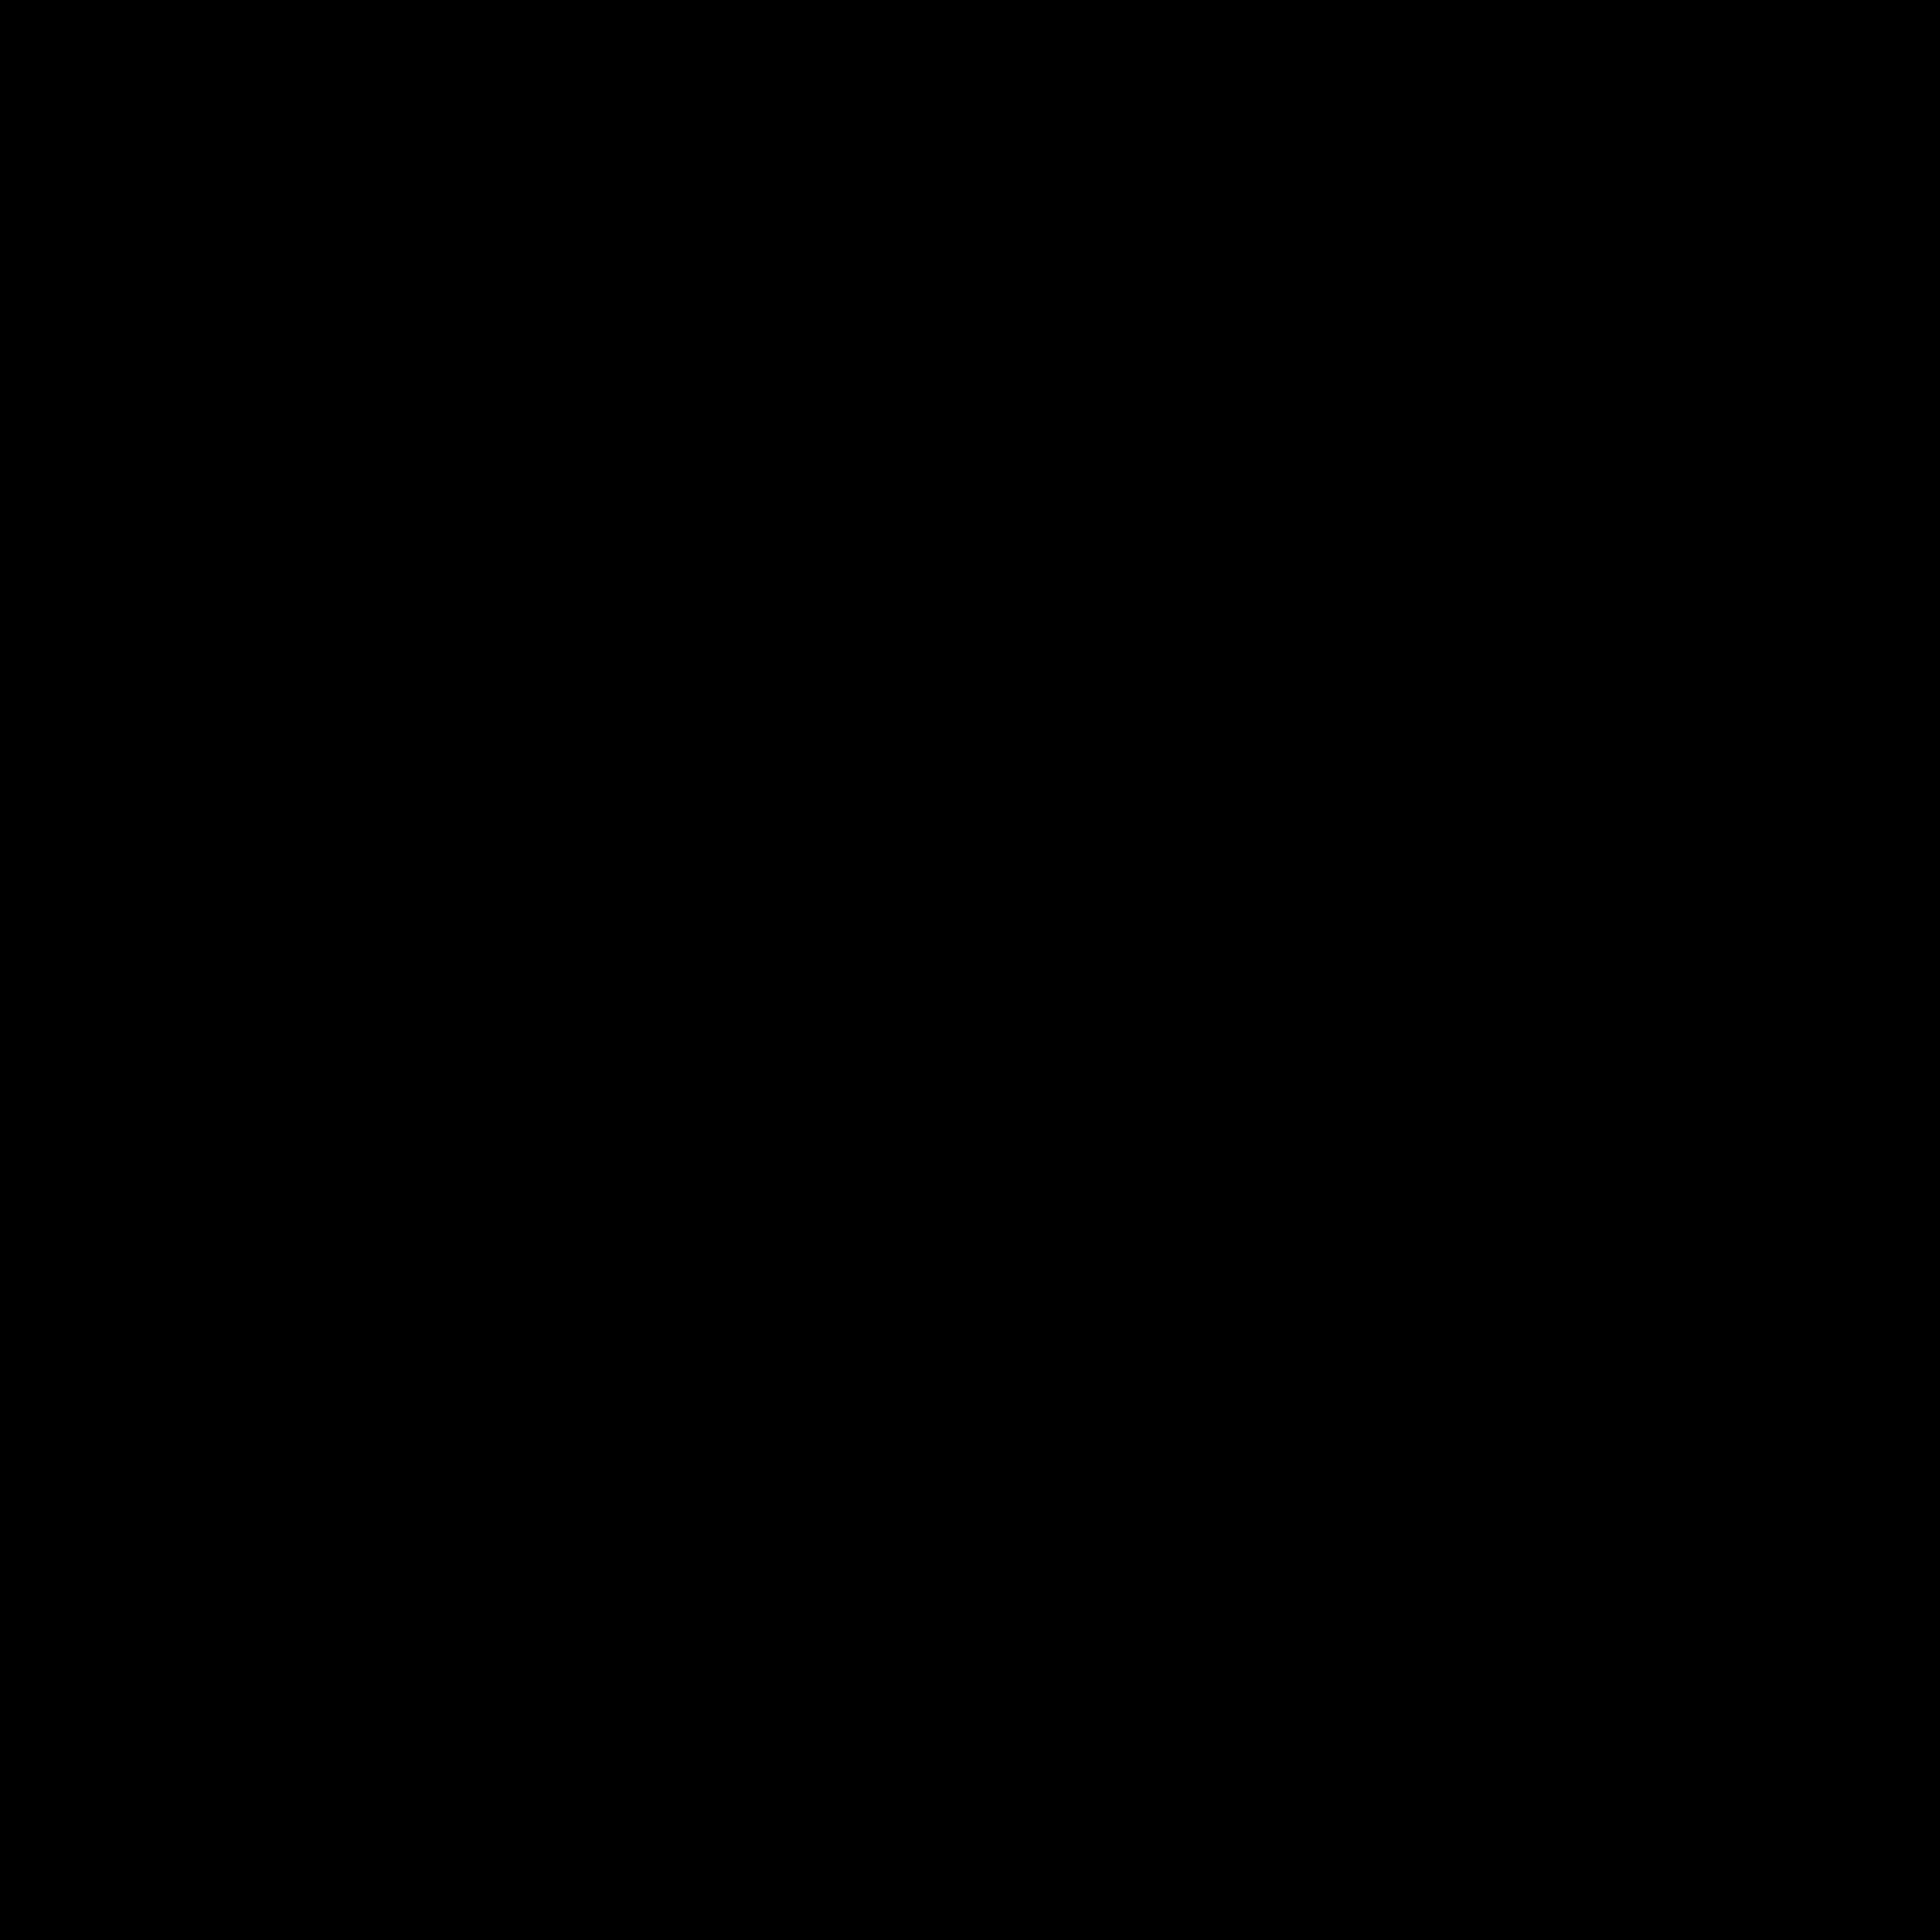 Clipart - Square frame 5